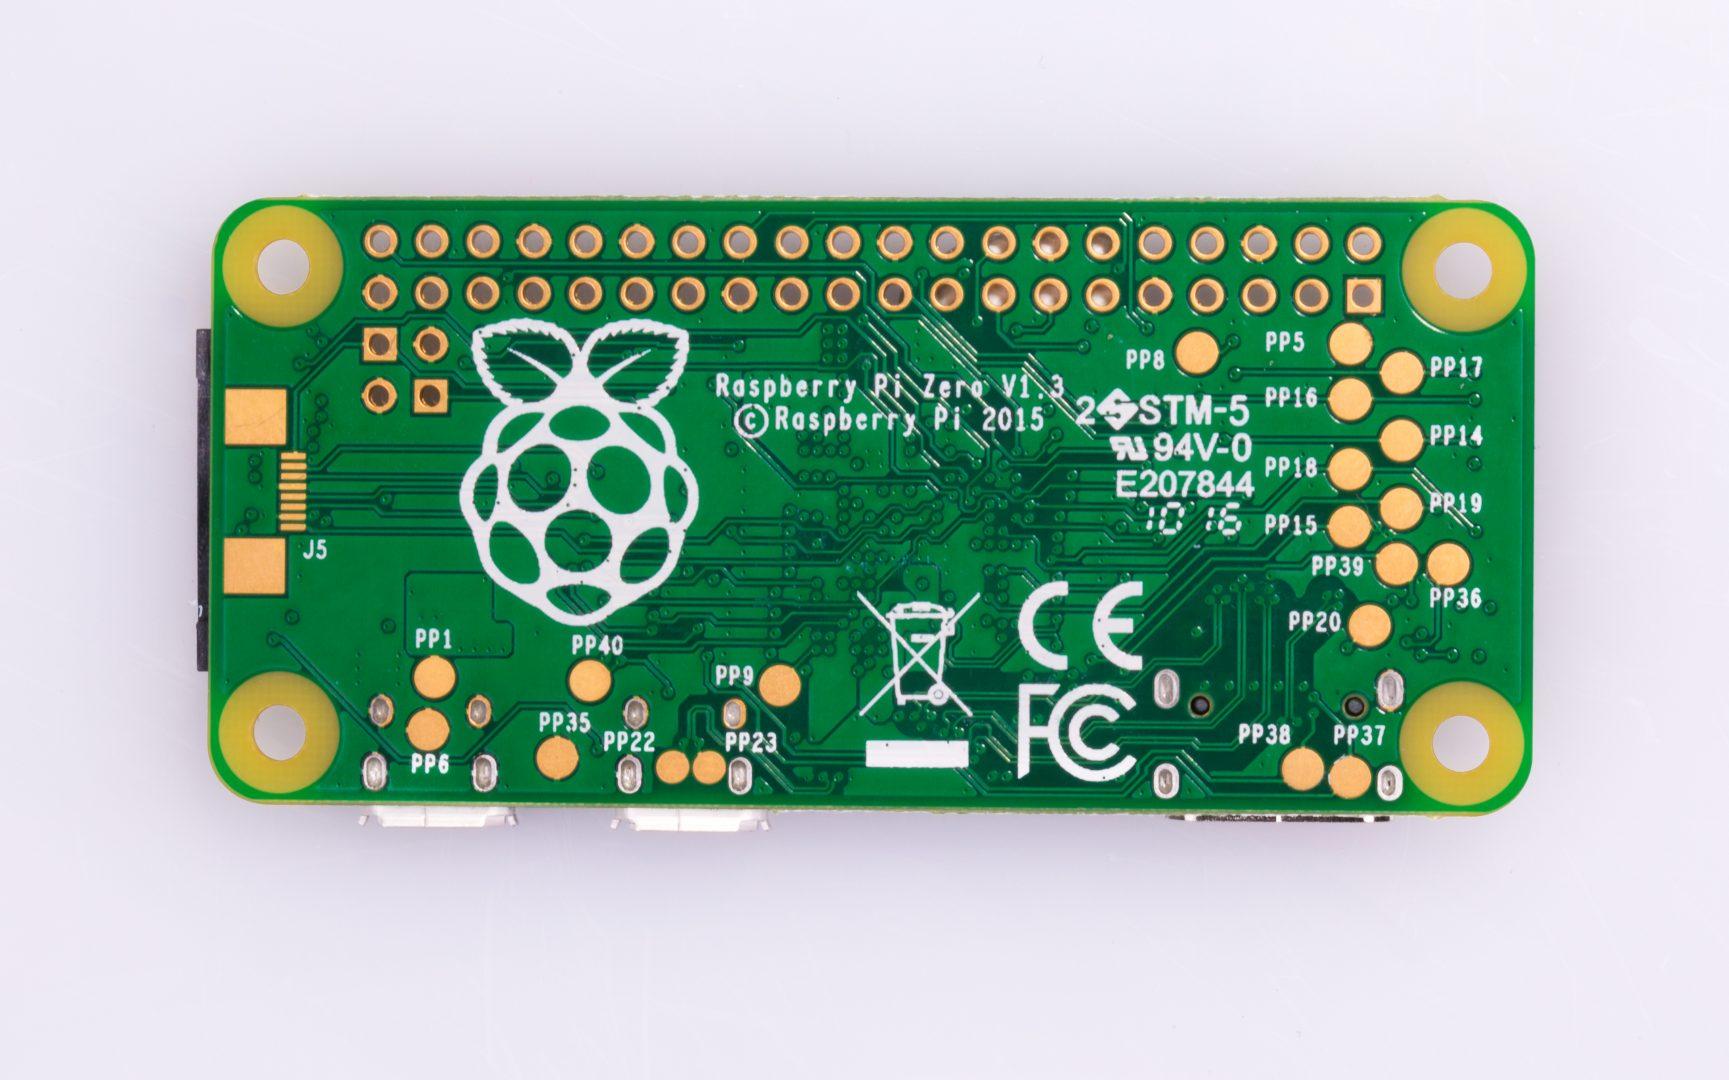 Raspberry pi zero a computer for 5 - Buy Now